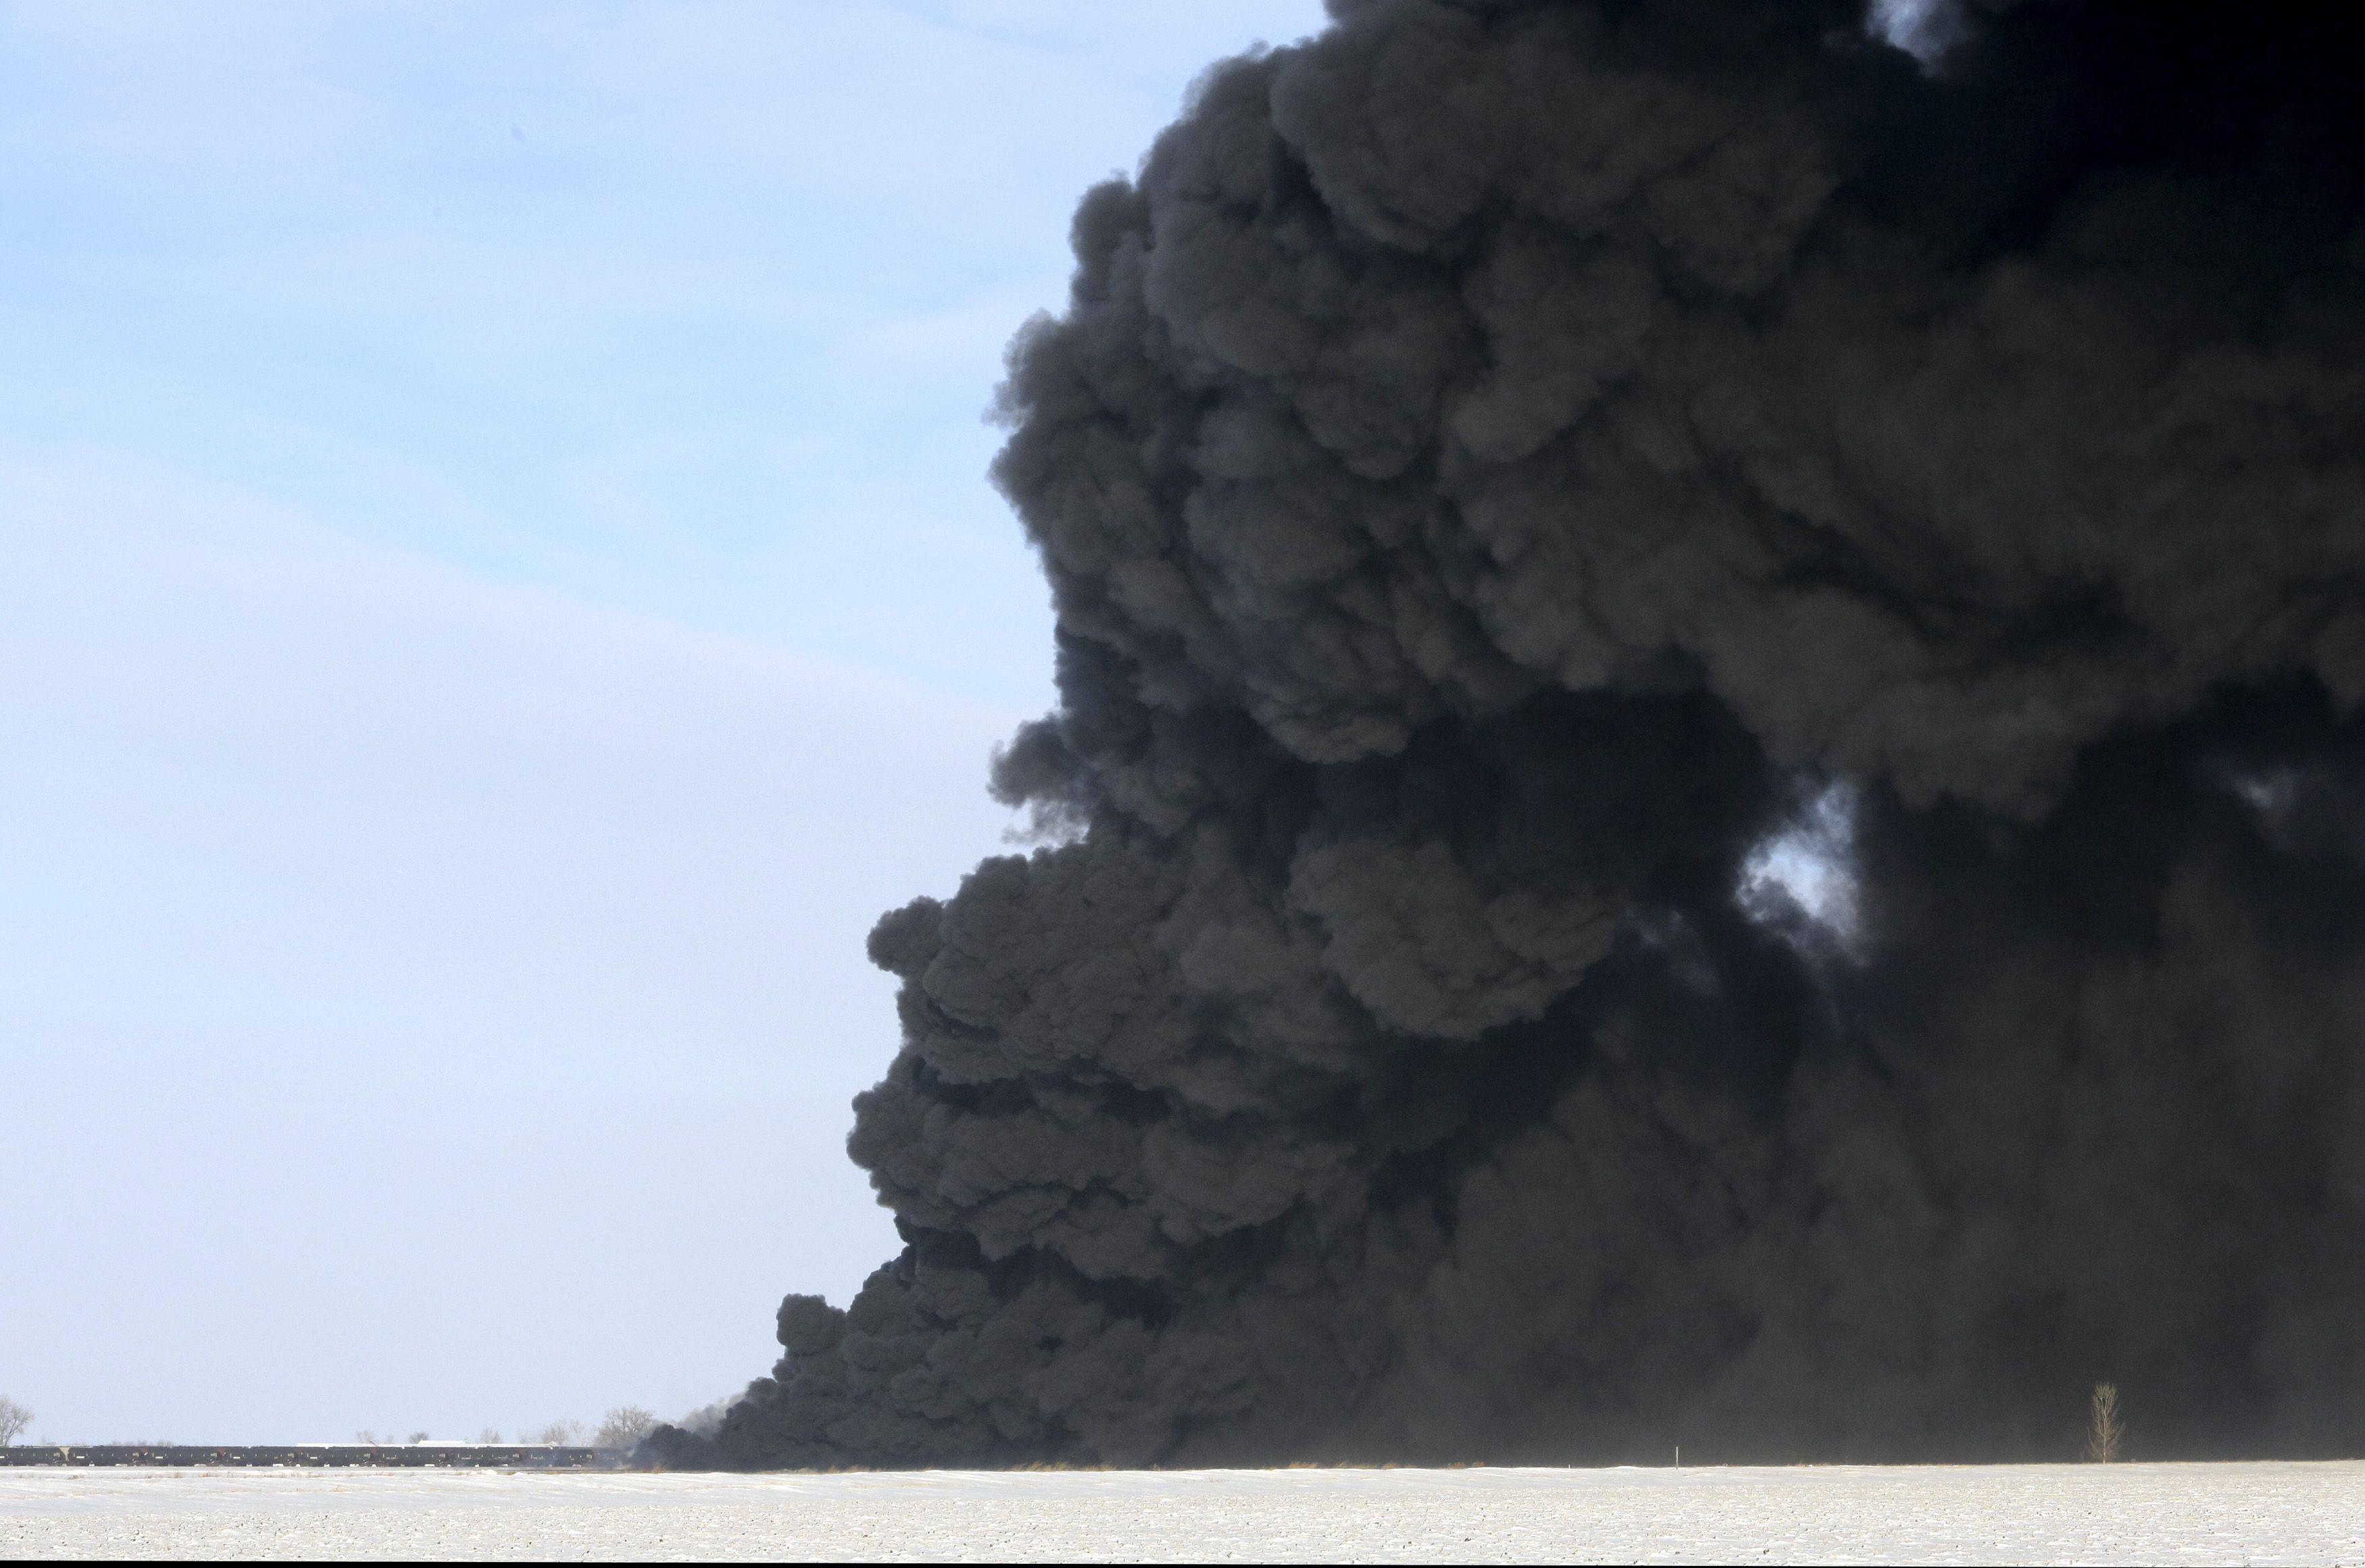 A plume of smoke rises from scene of a derailed train near Casselton, North Dakota